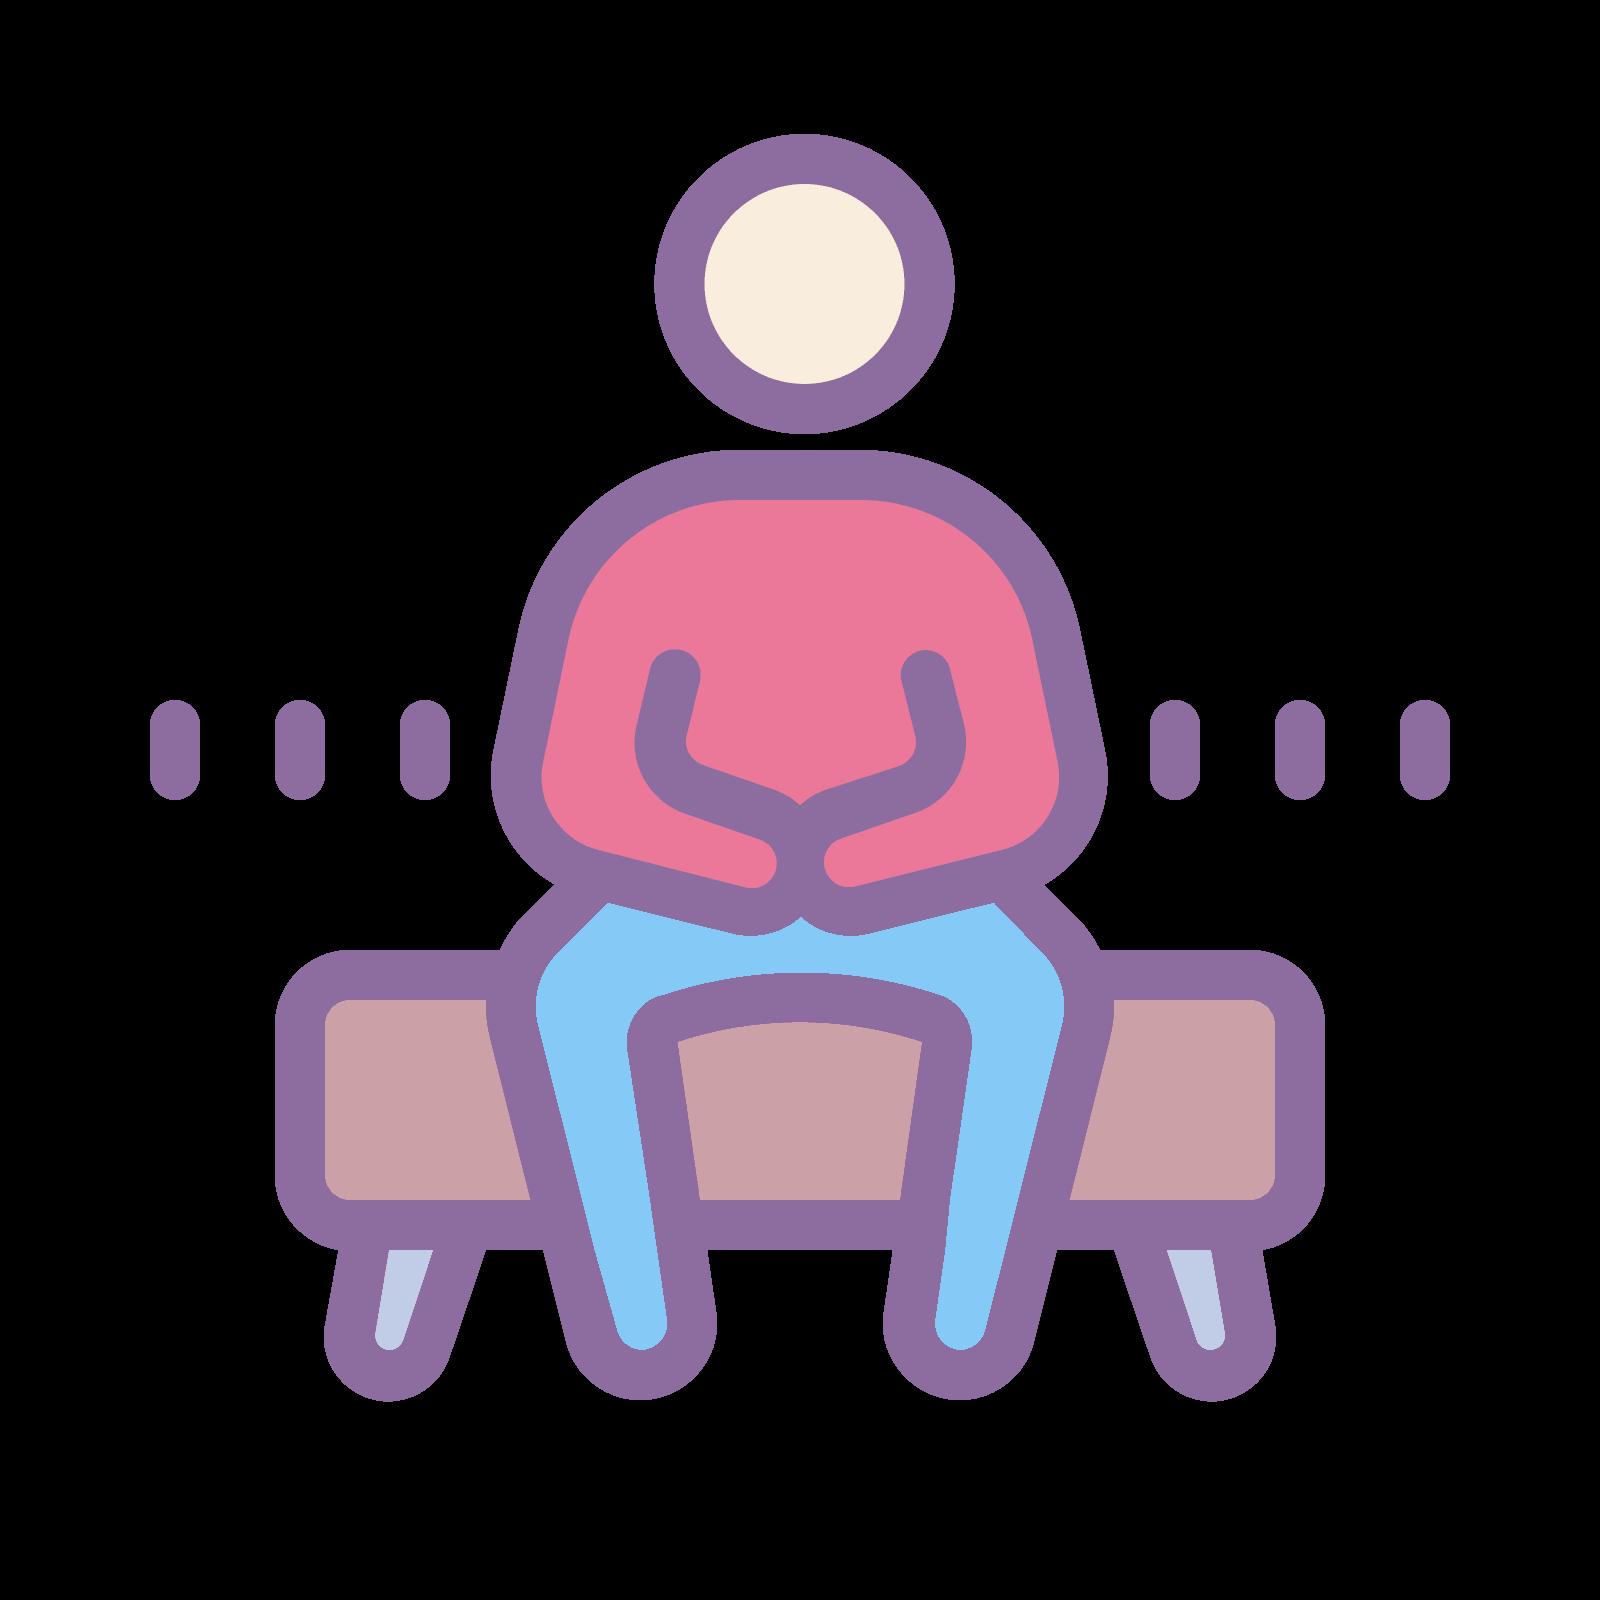 Counselor icono descarga gratuita. Counseling clipart two different person